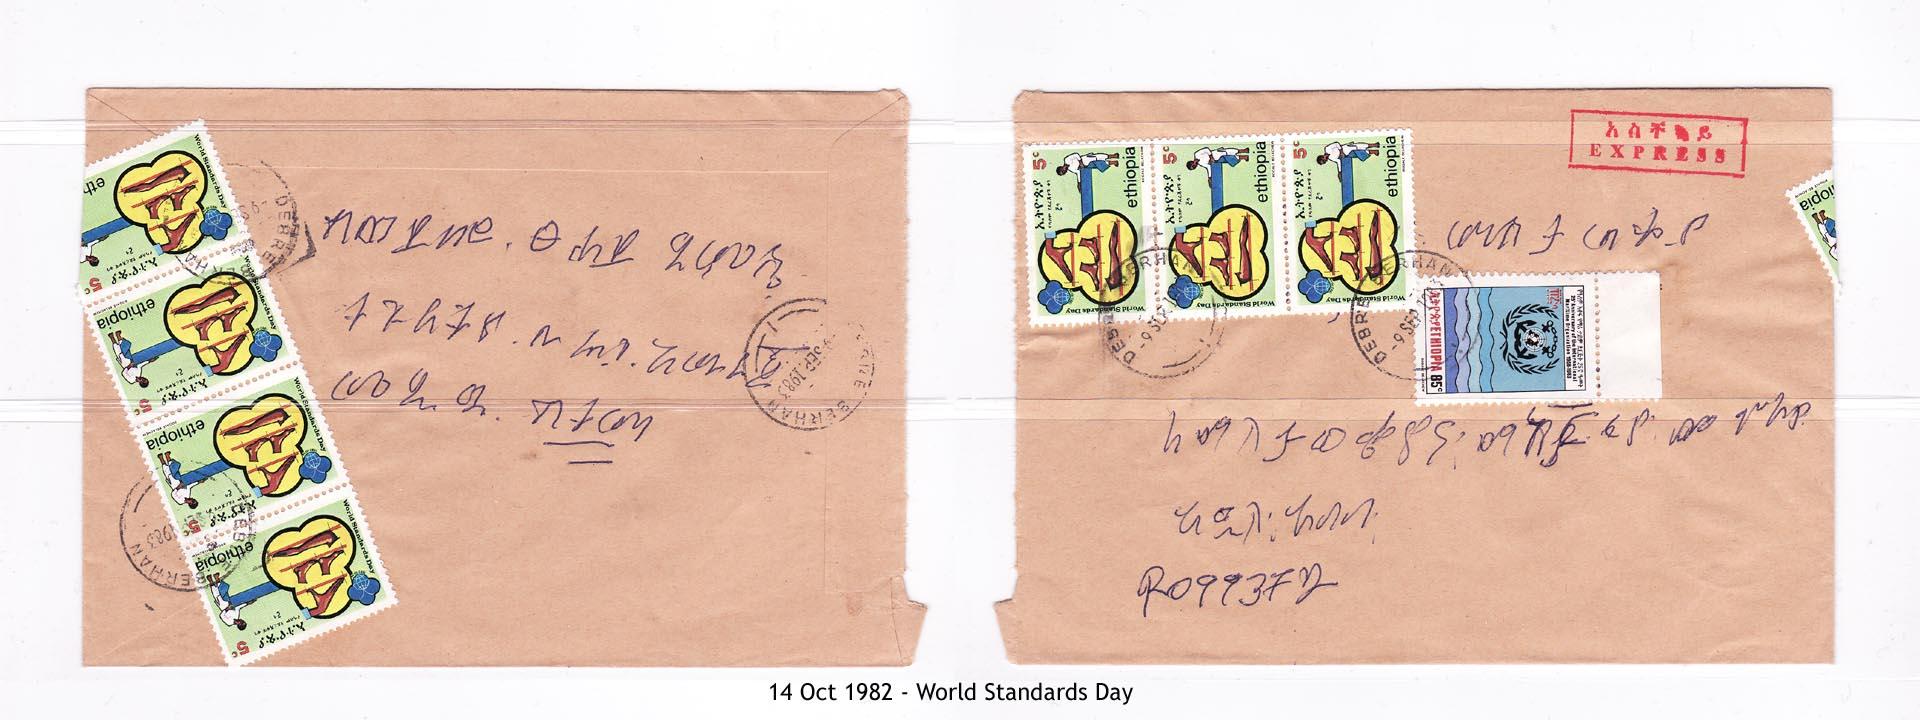 19821014 - World Standards Day